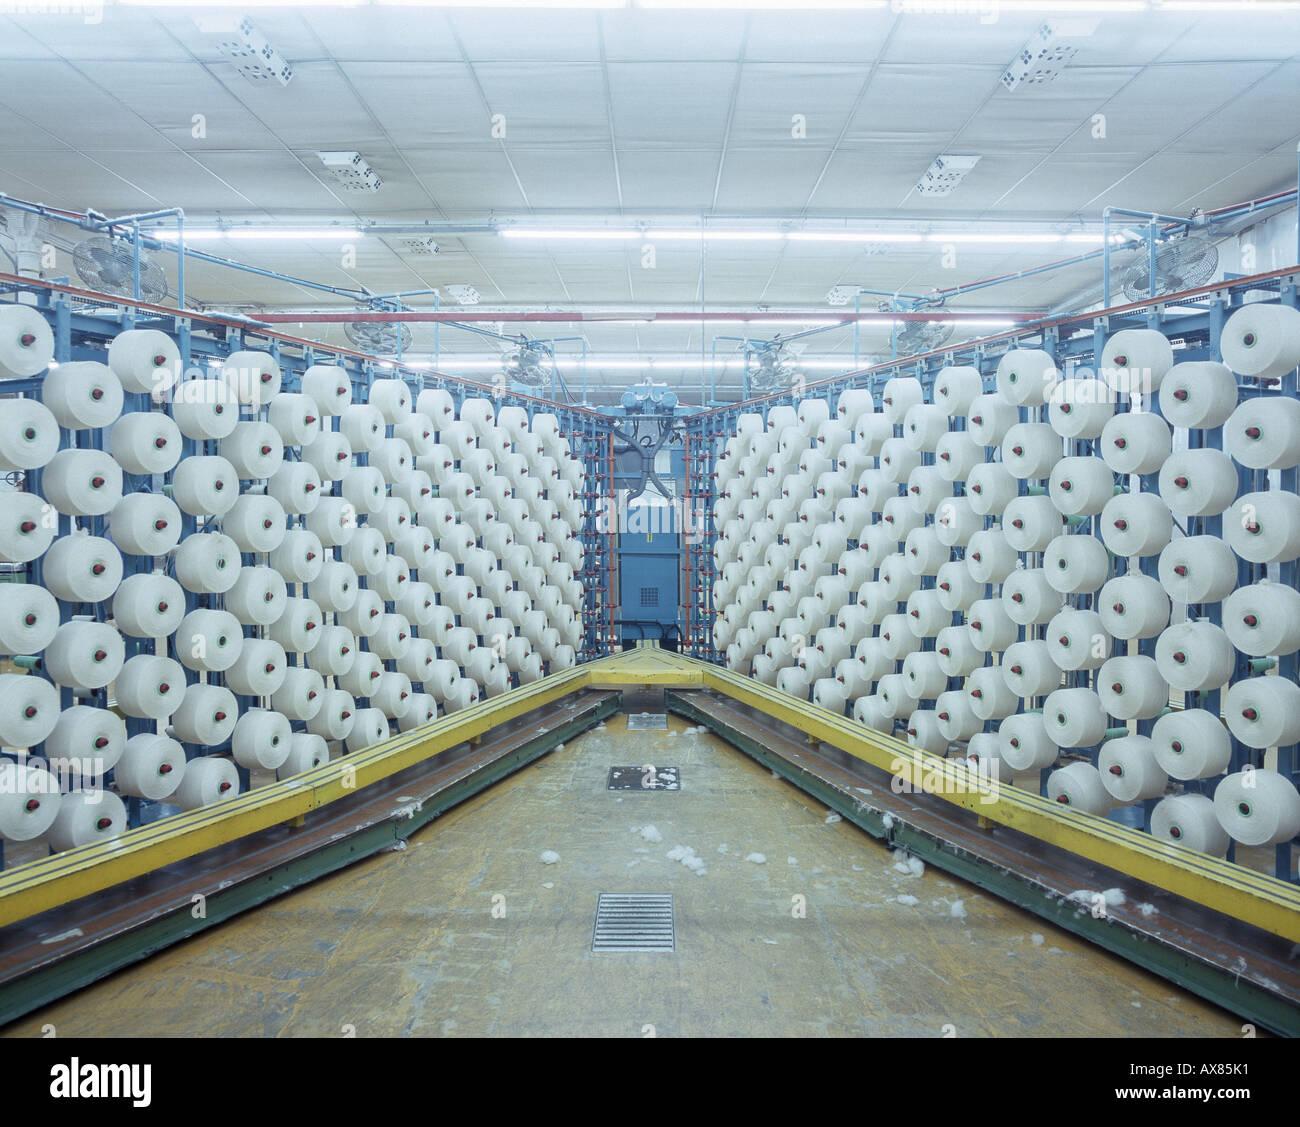 Cotton Yarnrolls, plying yarn, textile factory producing cotton fabrics, Legler S.p.A., Capriate near Bergamo, Italy - Stock Image